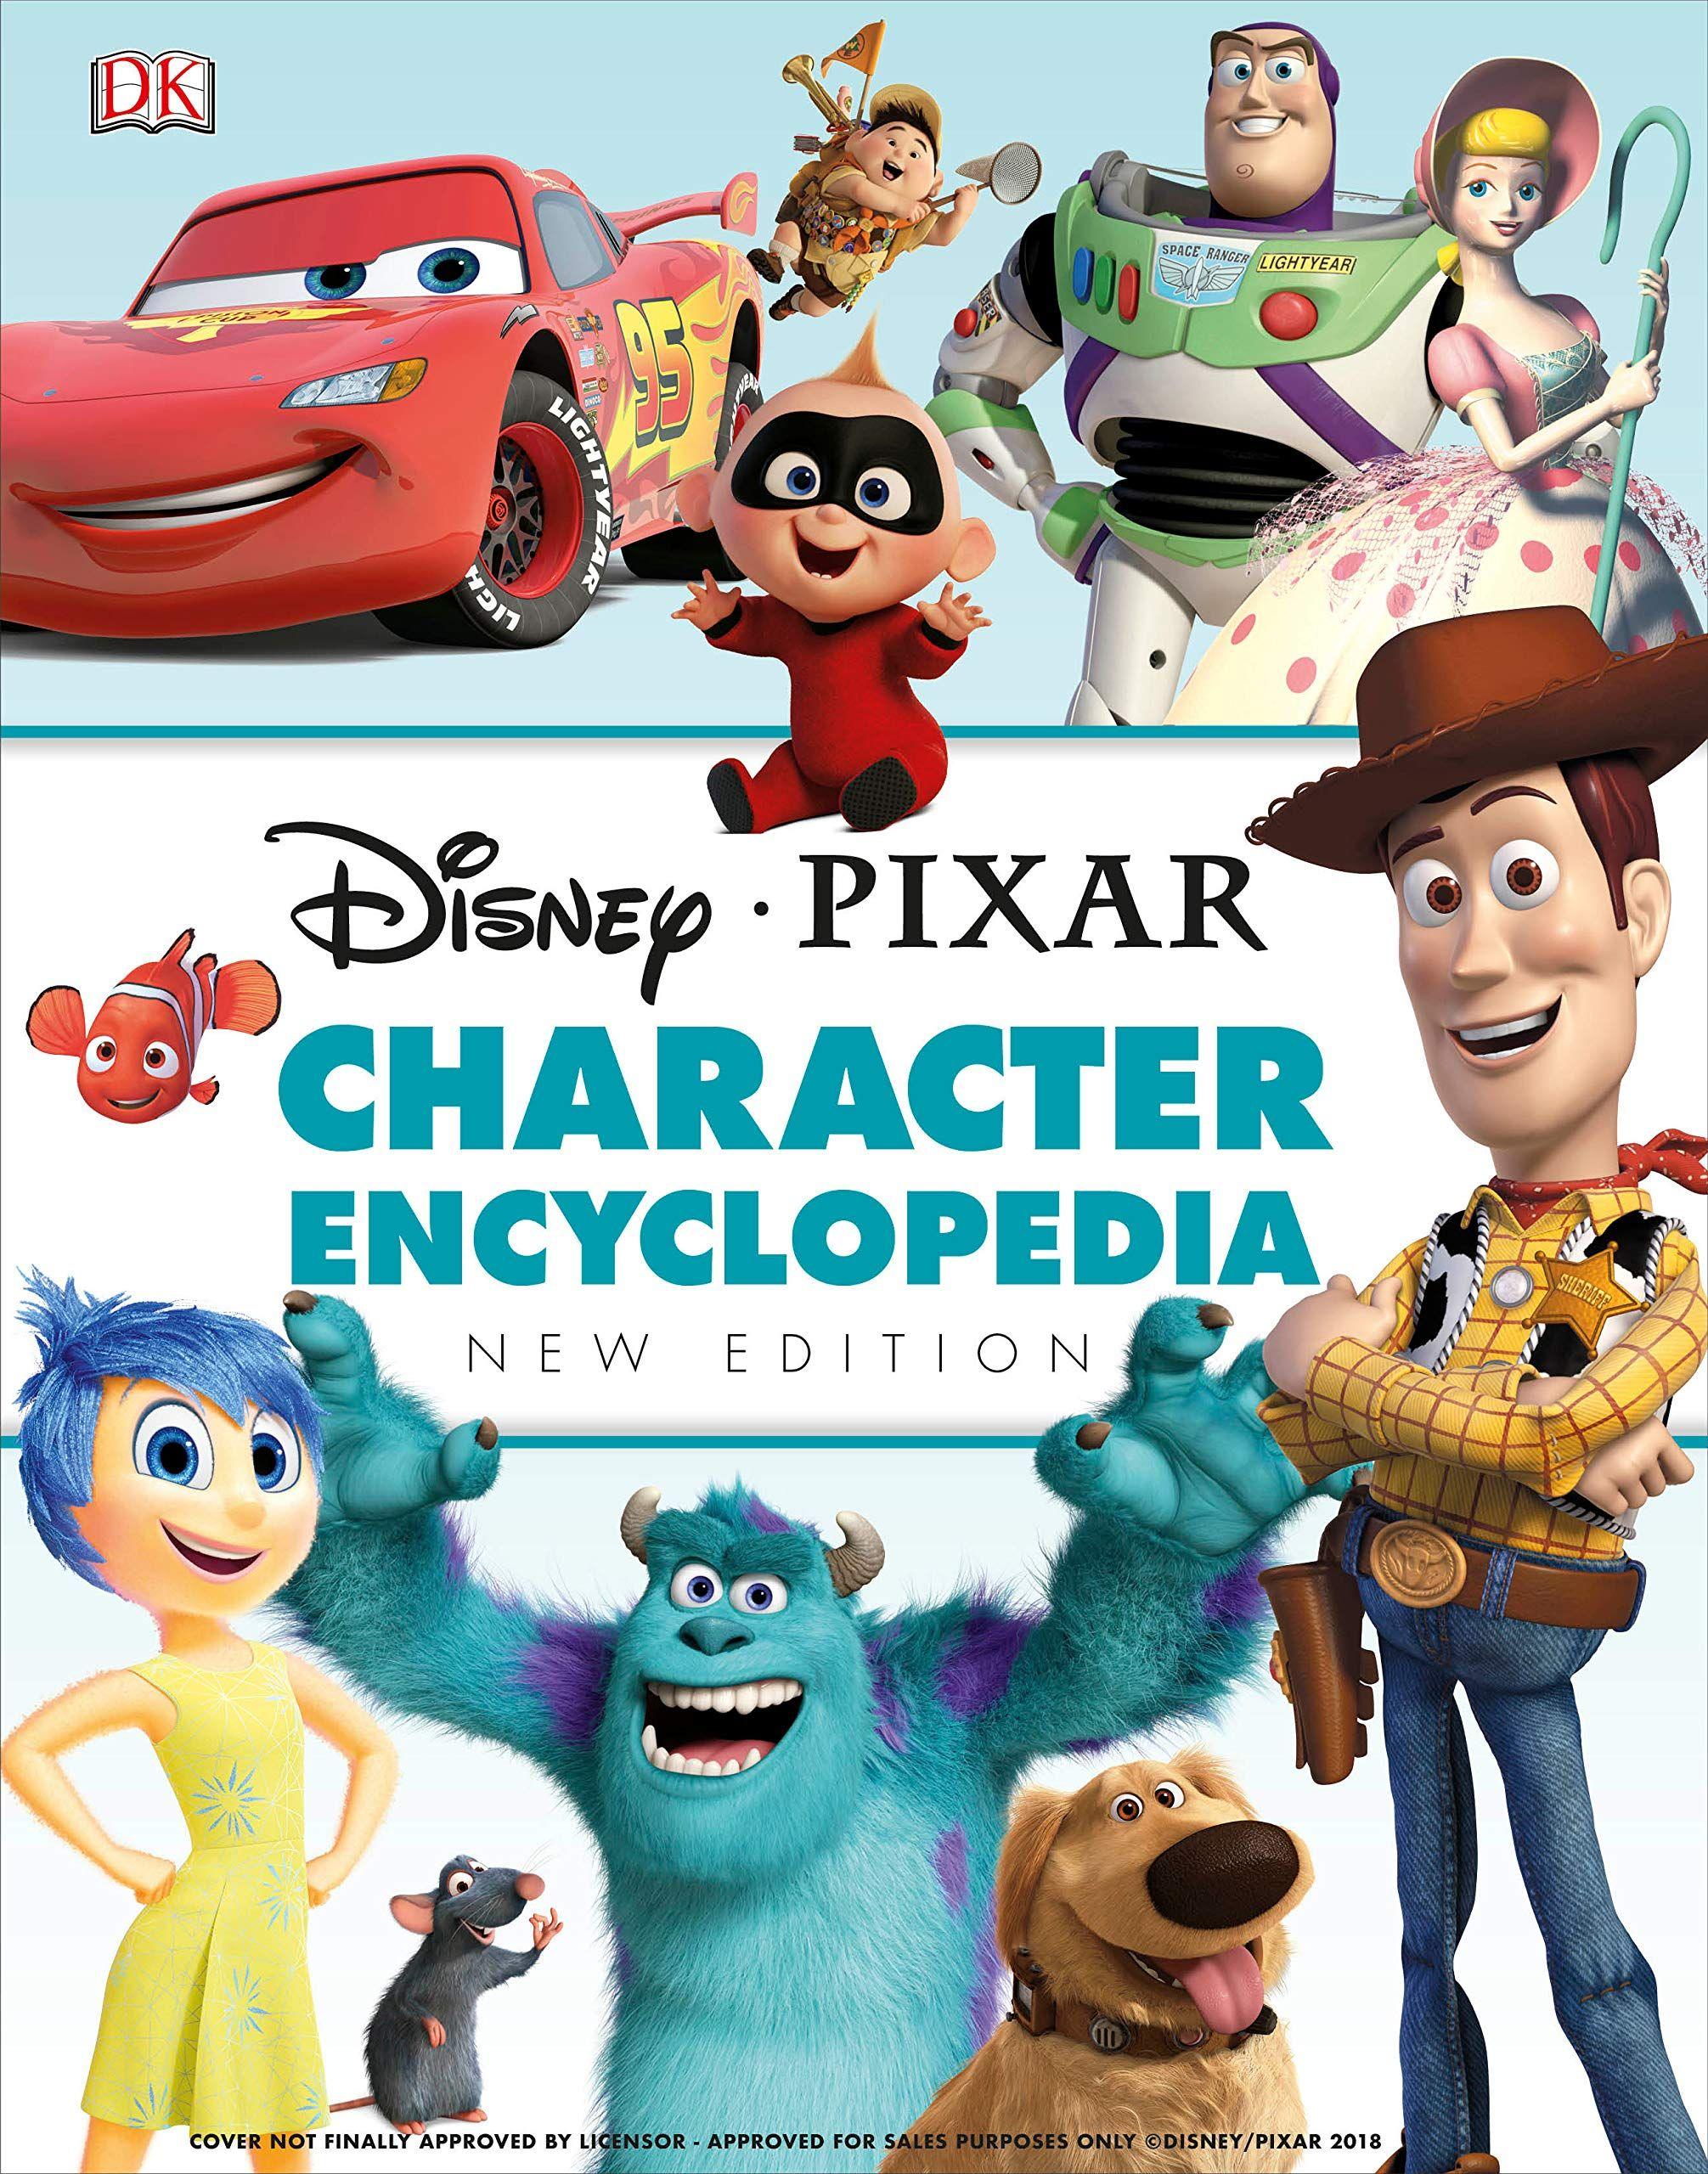 Disney pixar character encyclopedia new edition hardcover